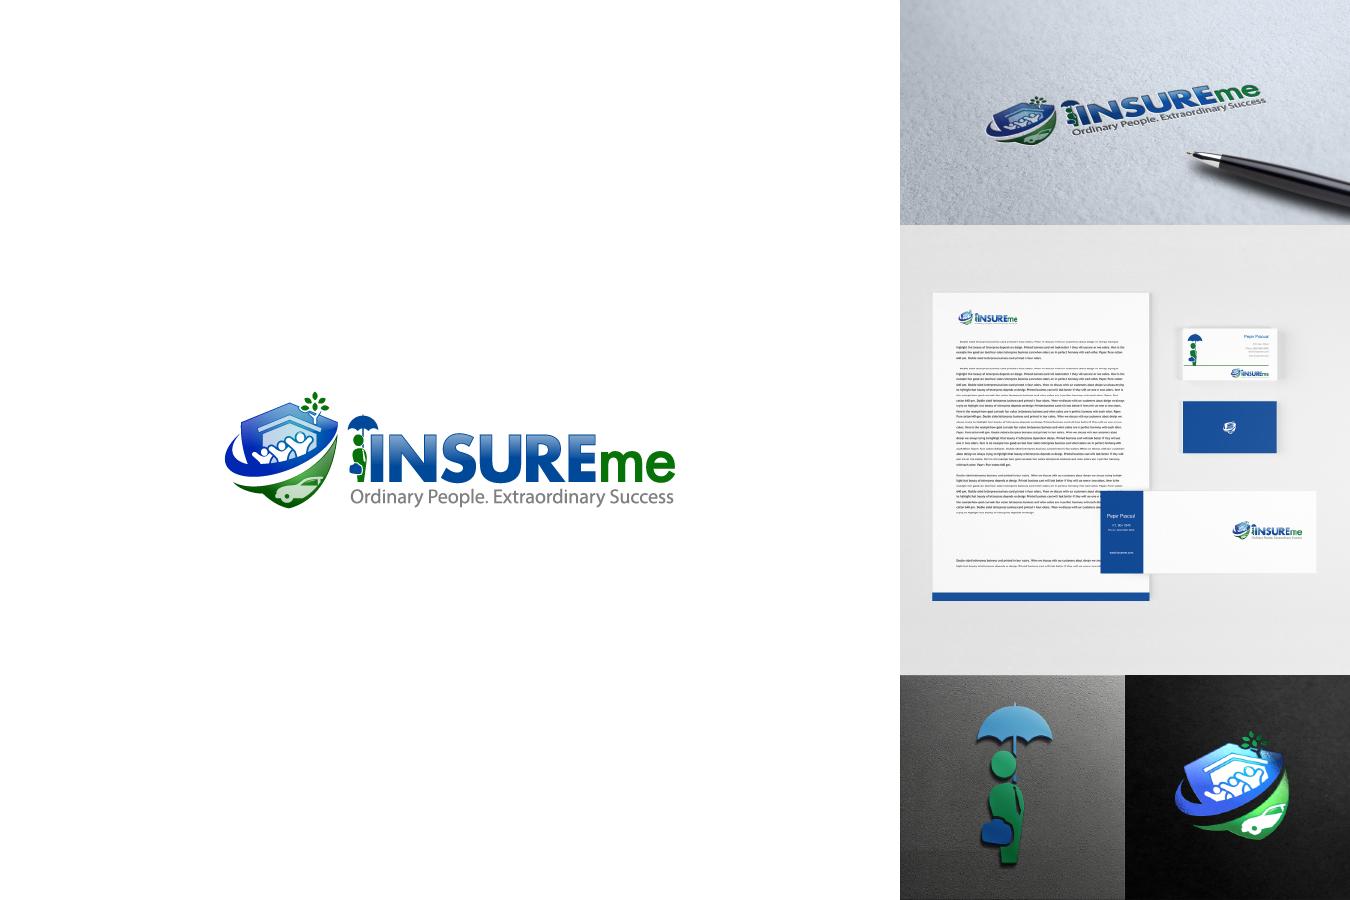 Create a winning logo for iINSUREme